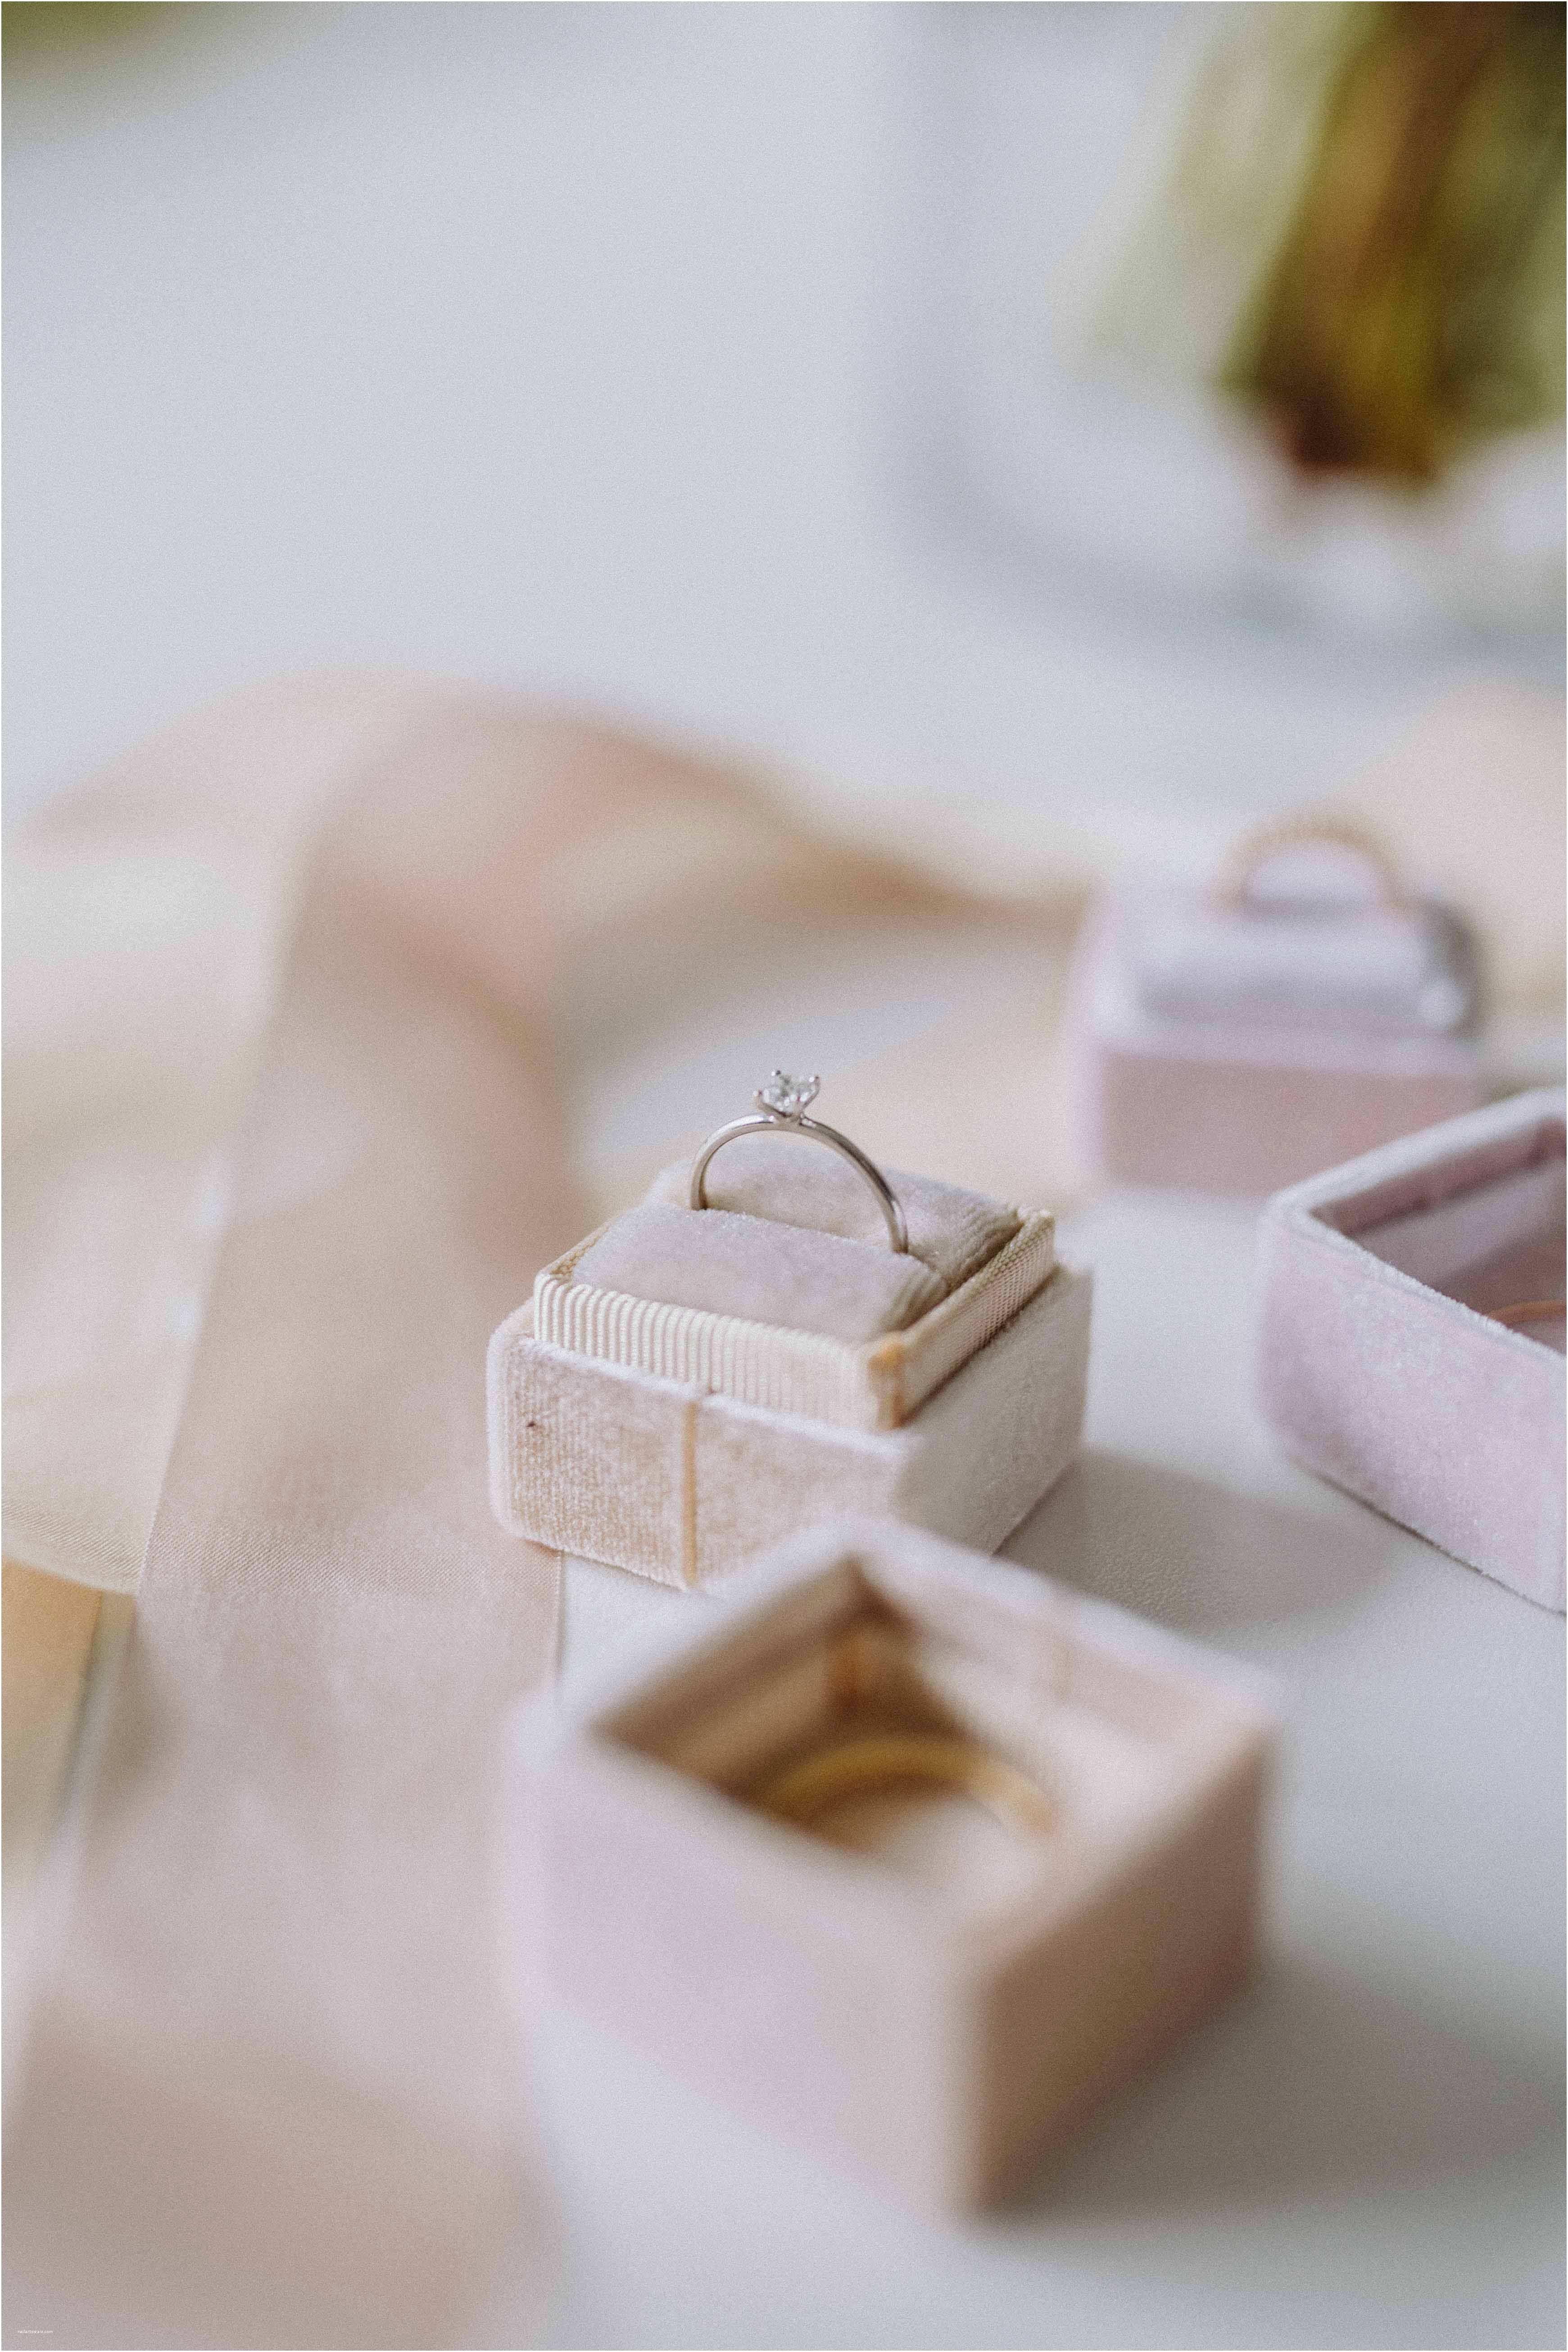 Rustic Wedding Invitations Under $1 Wedding Favors Under $1